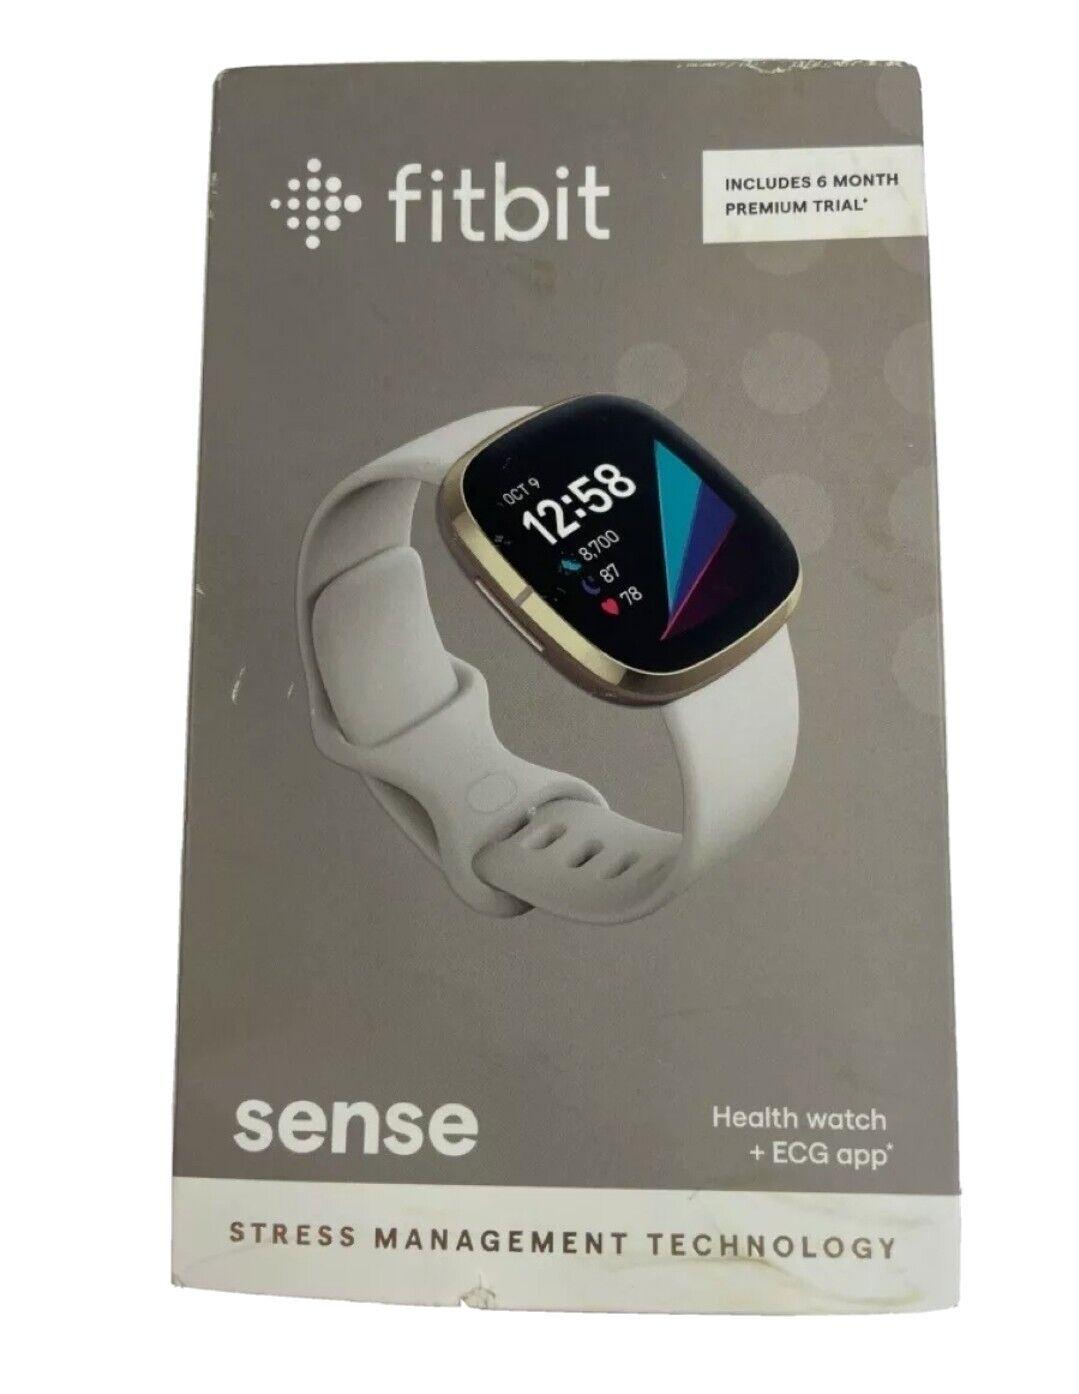 Fitbit Sense Advanced Health & Fitness Tracker Smartwatch - New In Box White